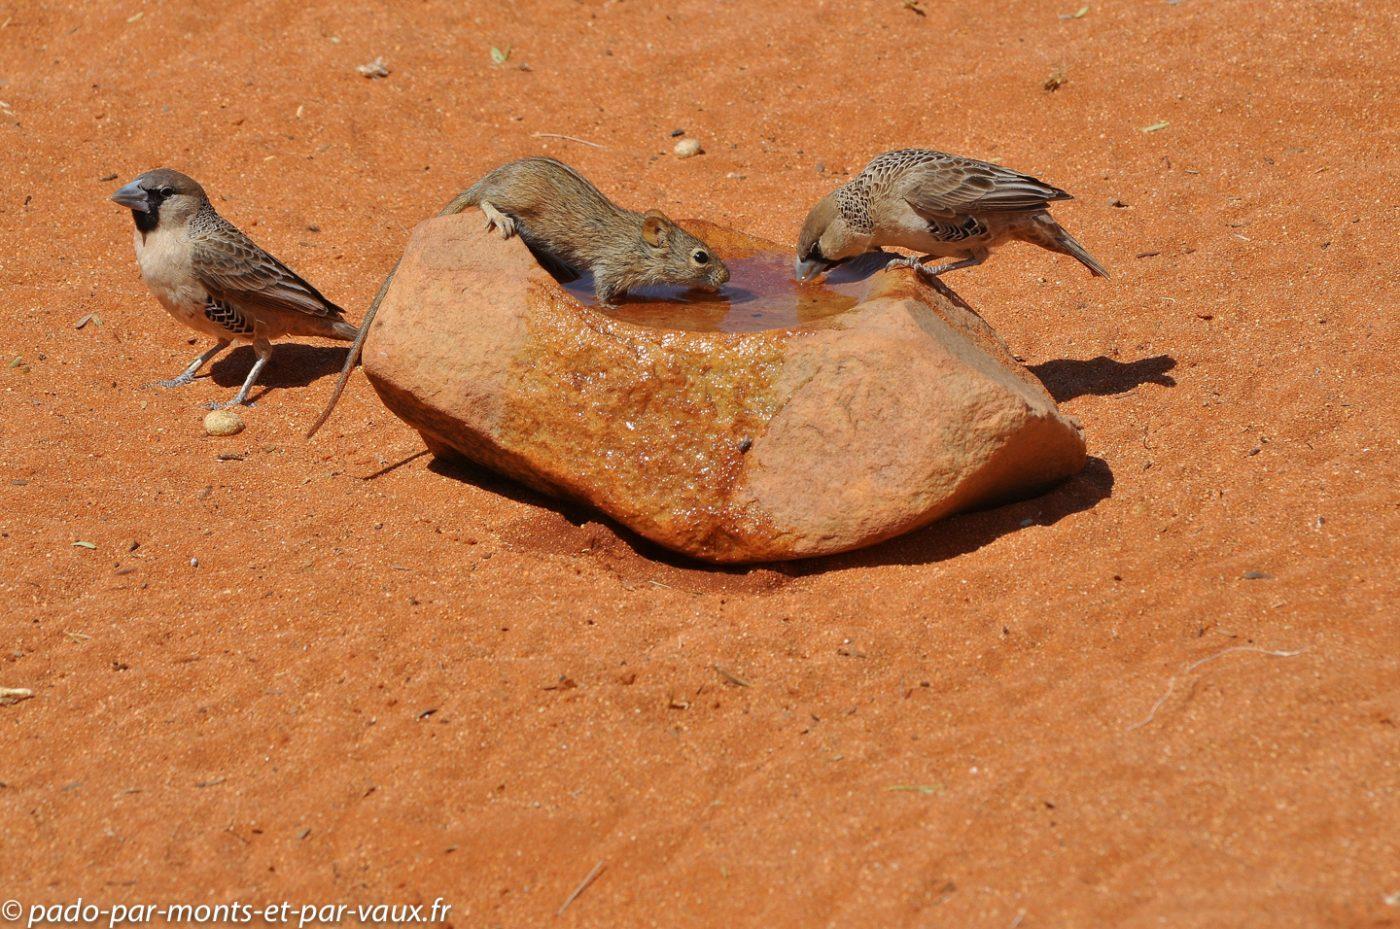 Namibie 2013 - Tok Tokkie trail - Republicains sociaux et souris rayee